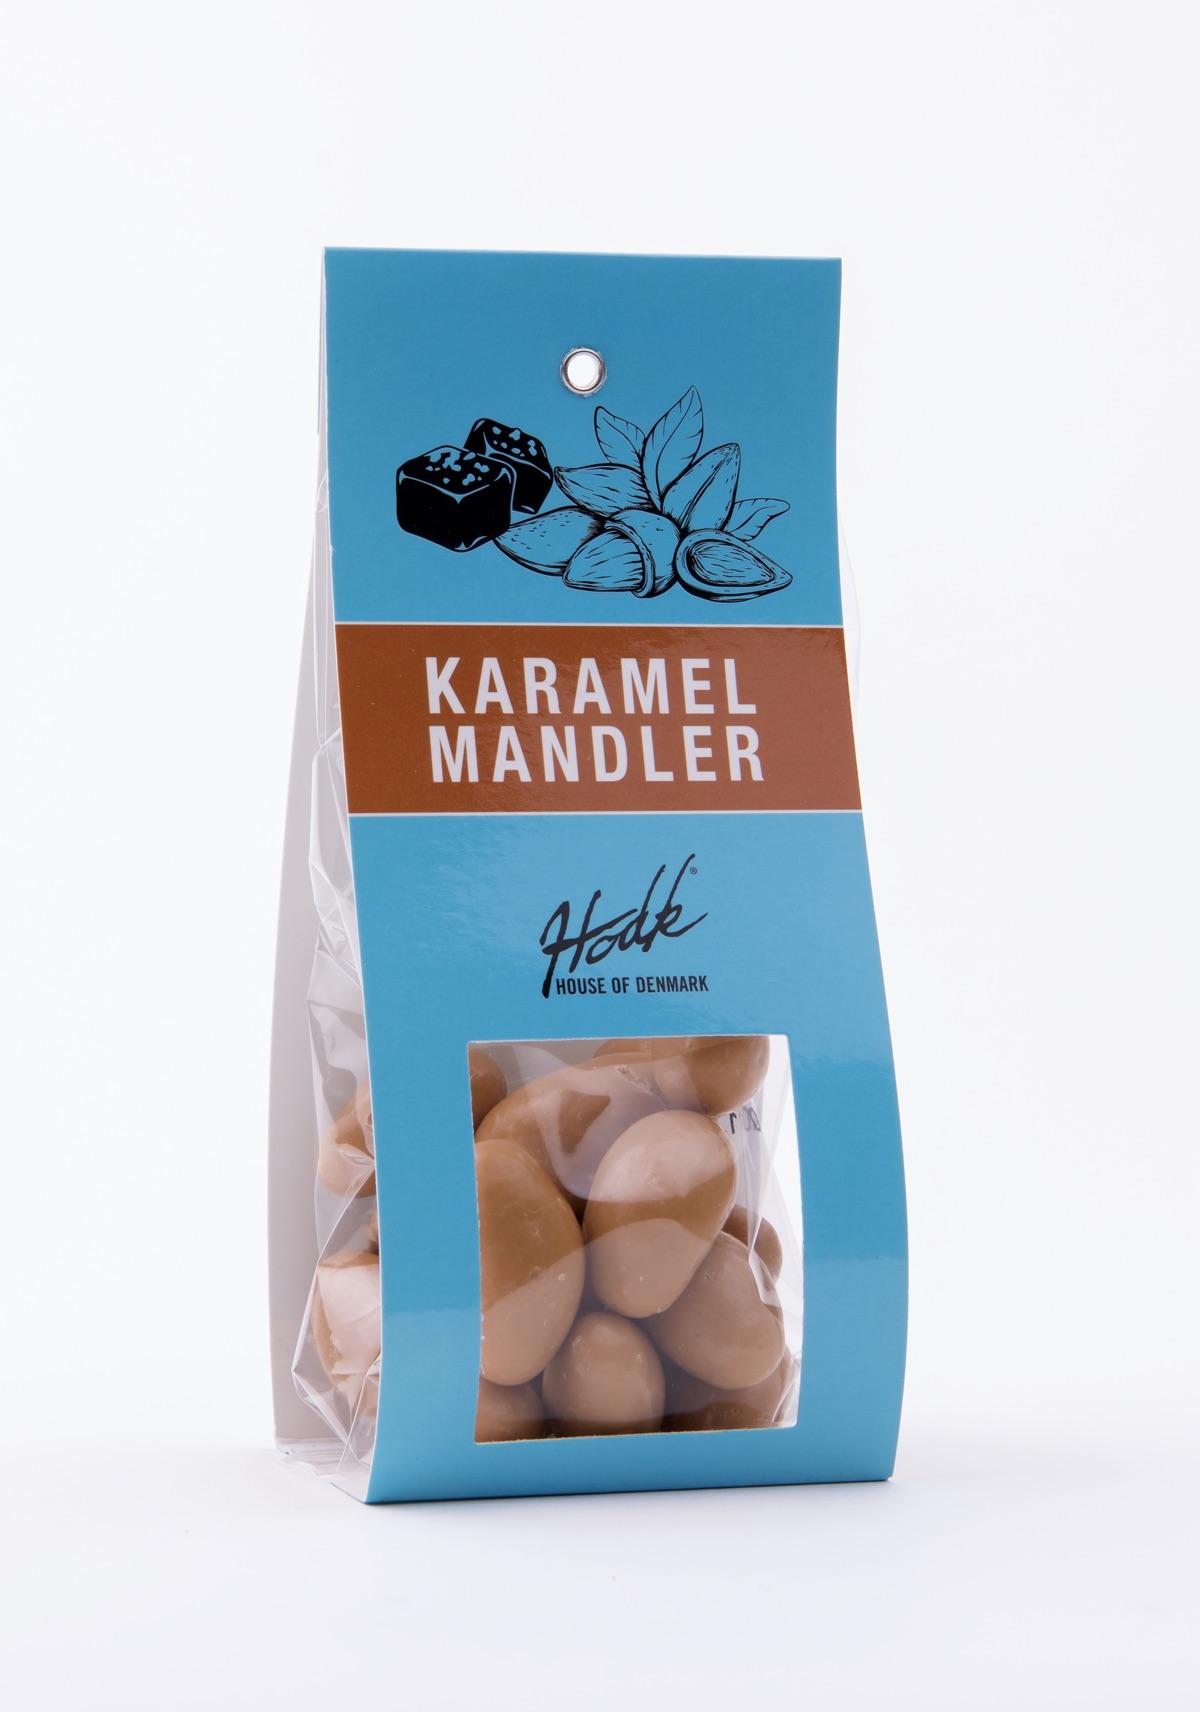 Karamel Mandler